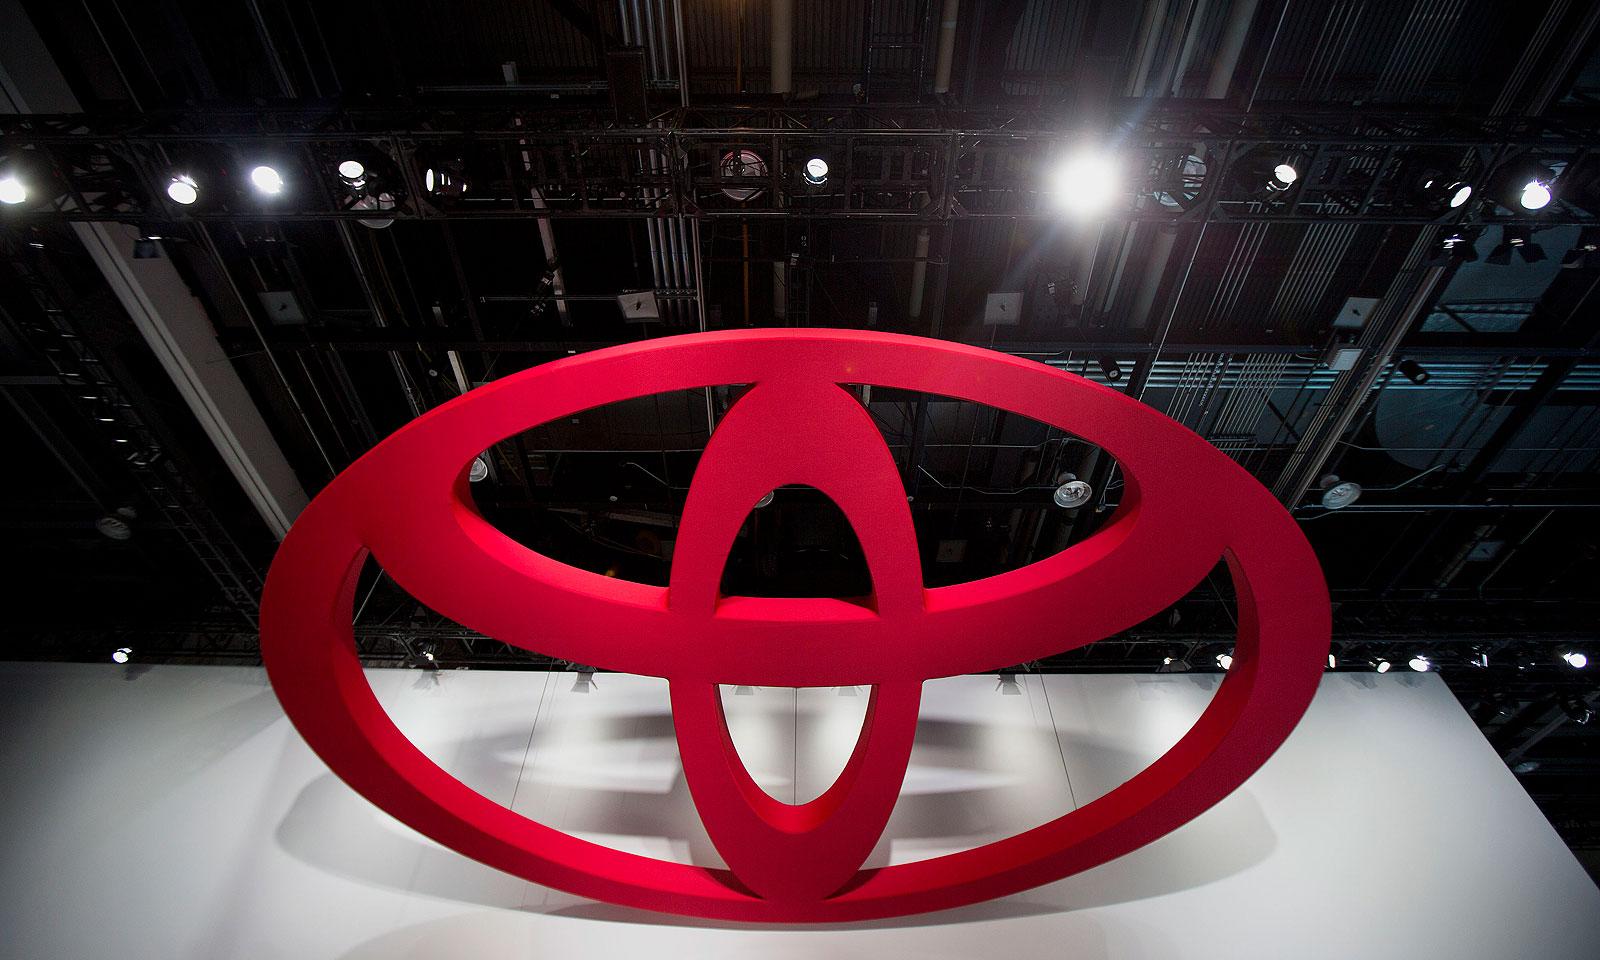 Marca Toyota continua a destacar-se a nível global